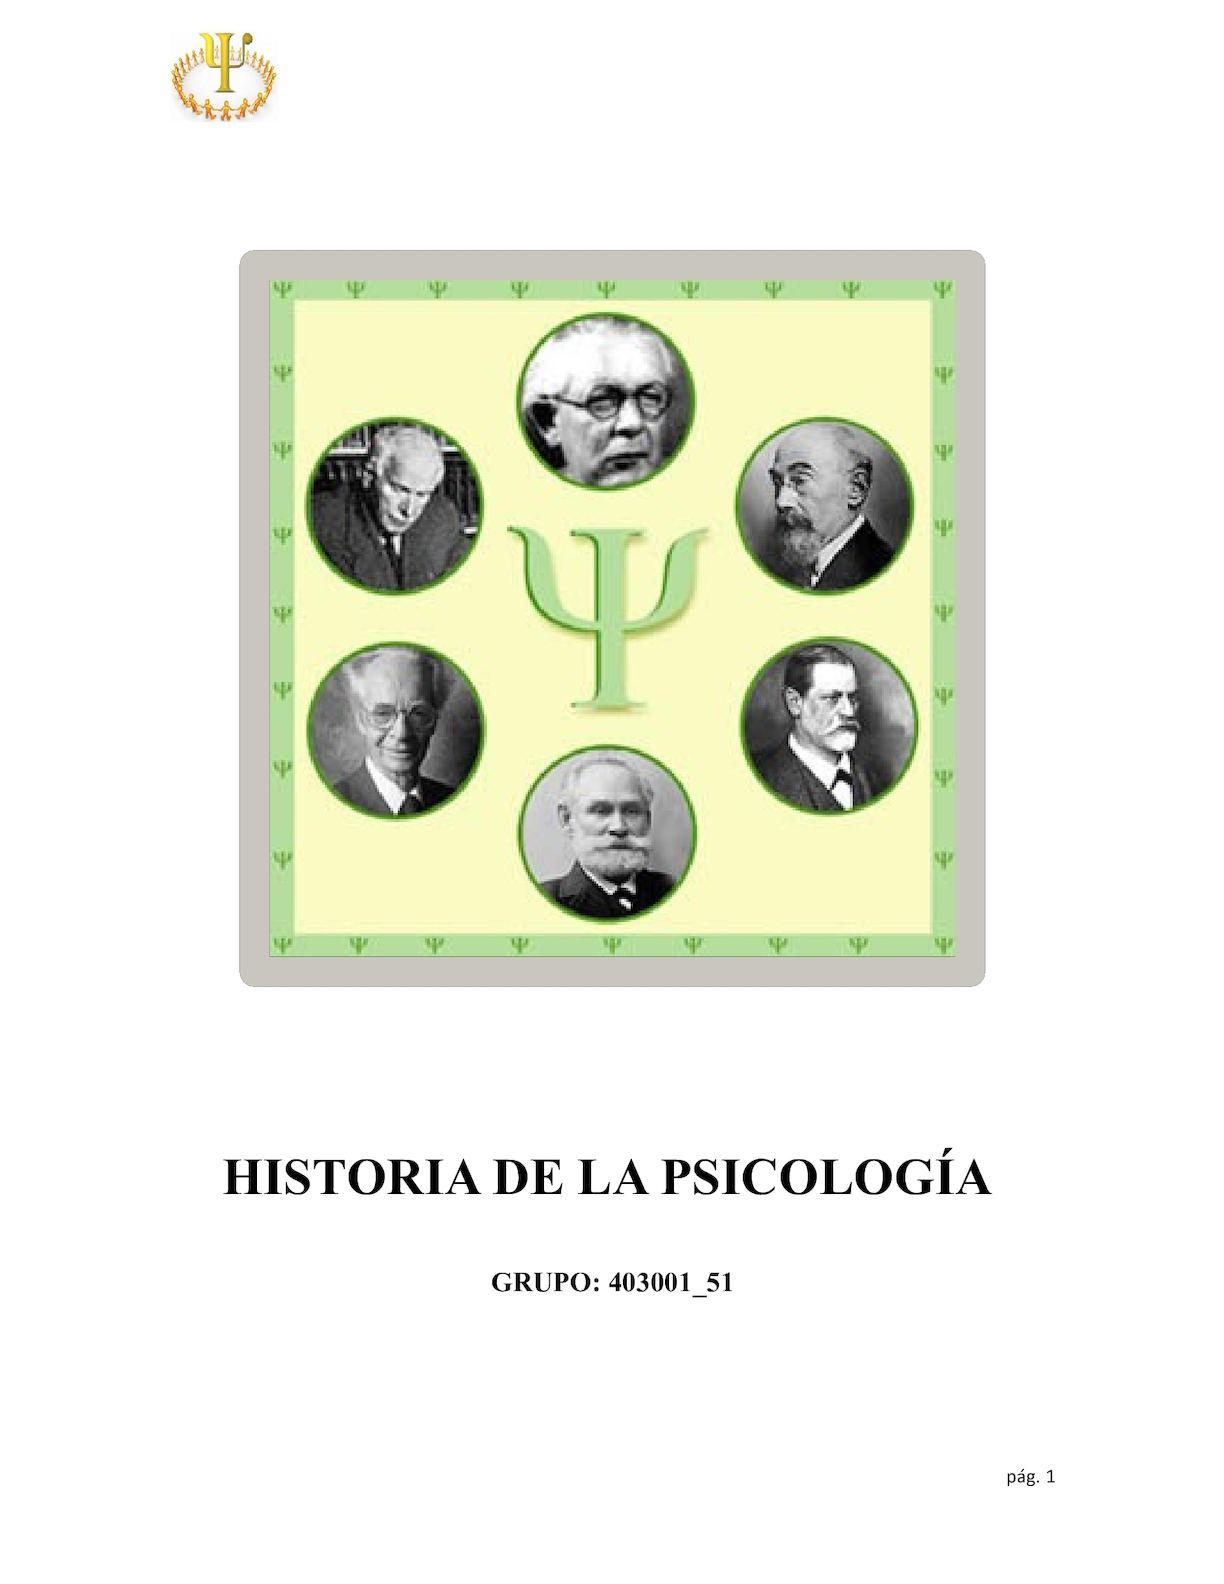 Evaluacion Final Del Curso Historia De La Psicologia 403001 51 (1)